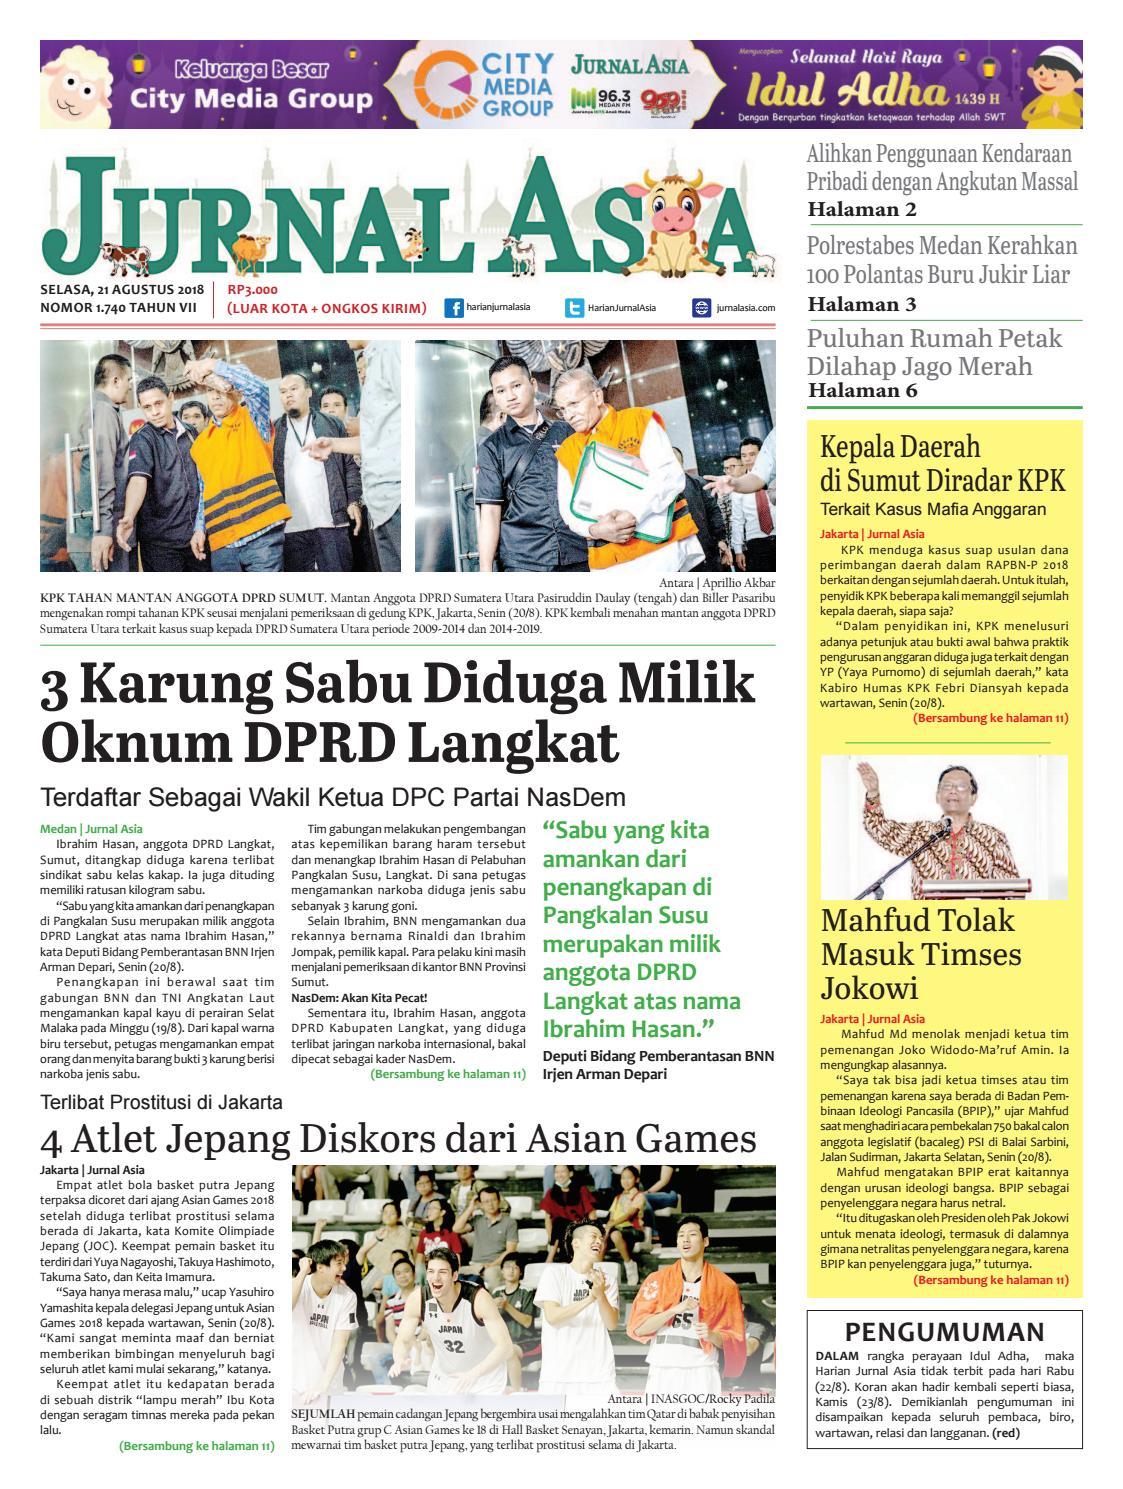 Harian Jurnal Asia Edisi Selasa 21 Agustus 2018 By Harian